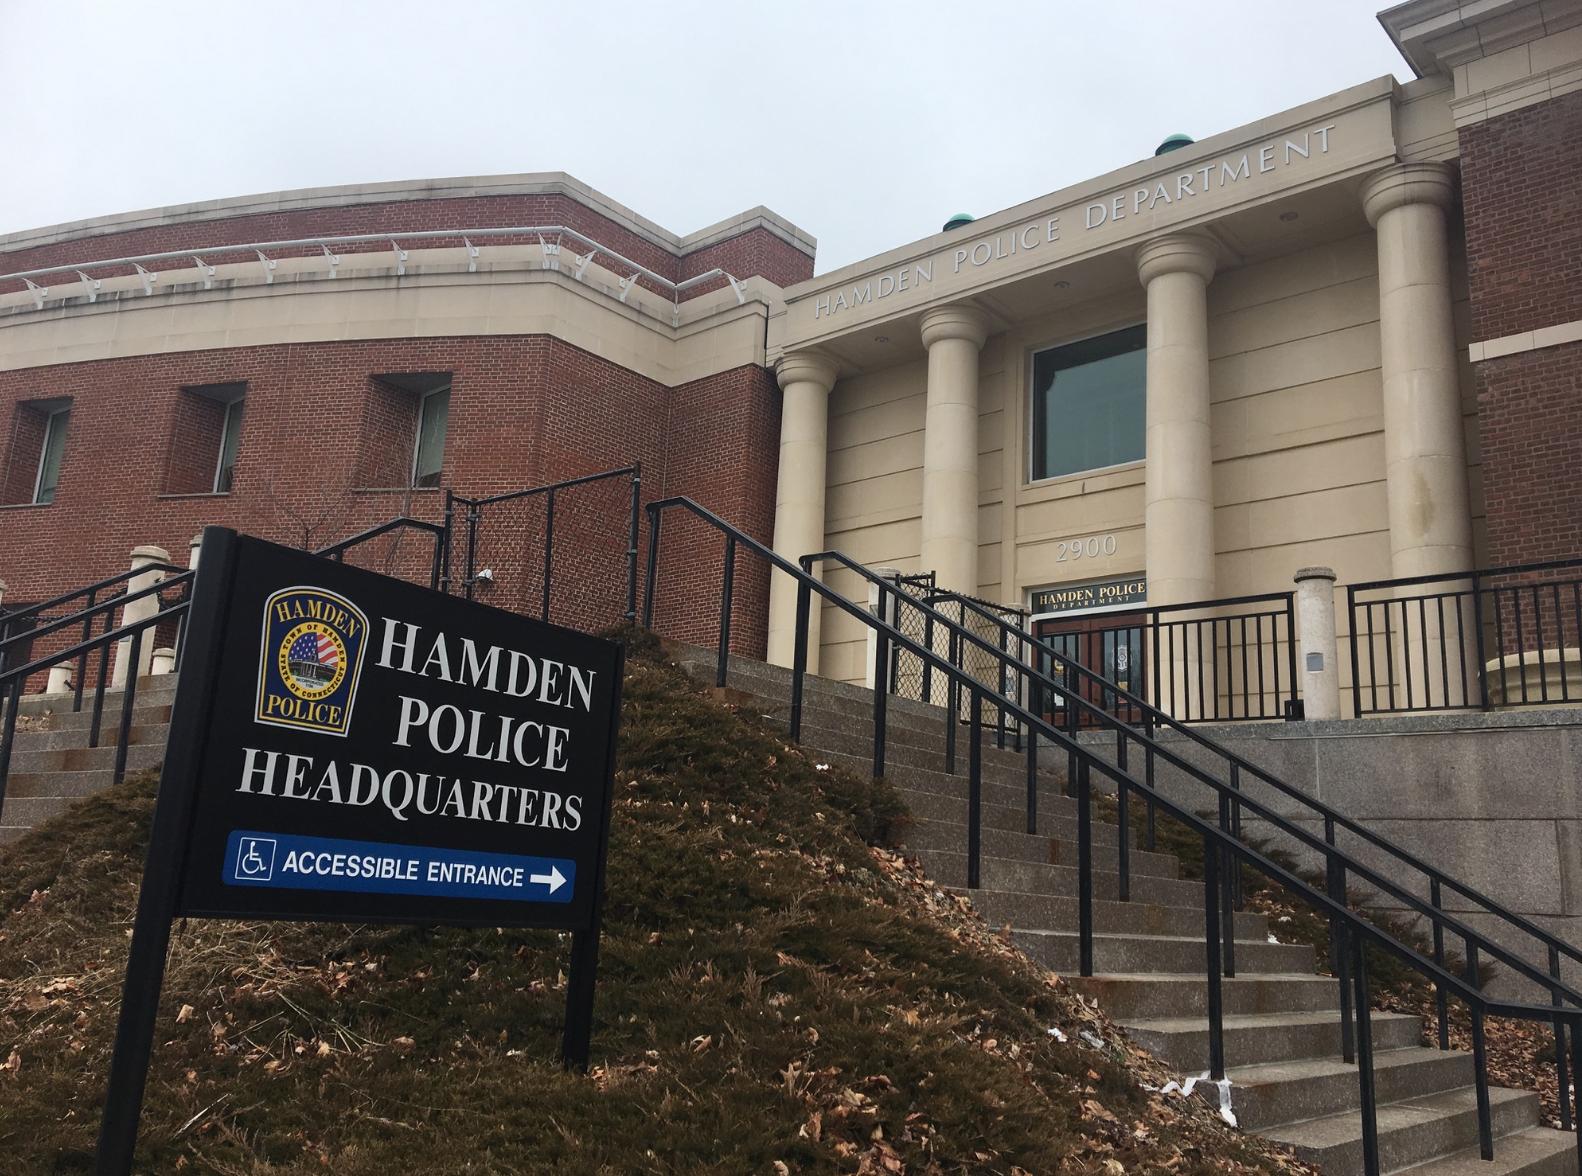 Hamden police officer under investigation for 'concerning' body camera video